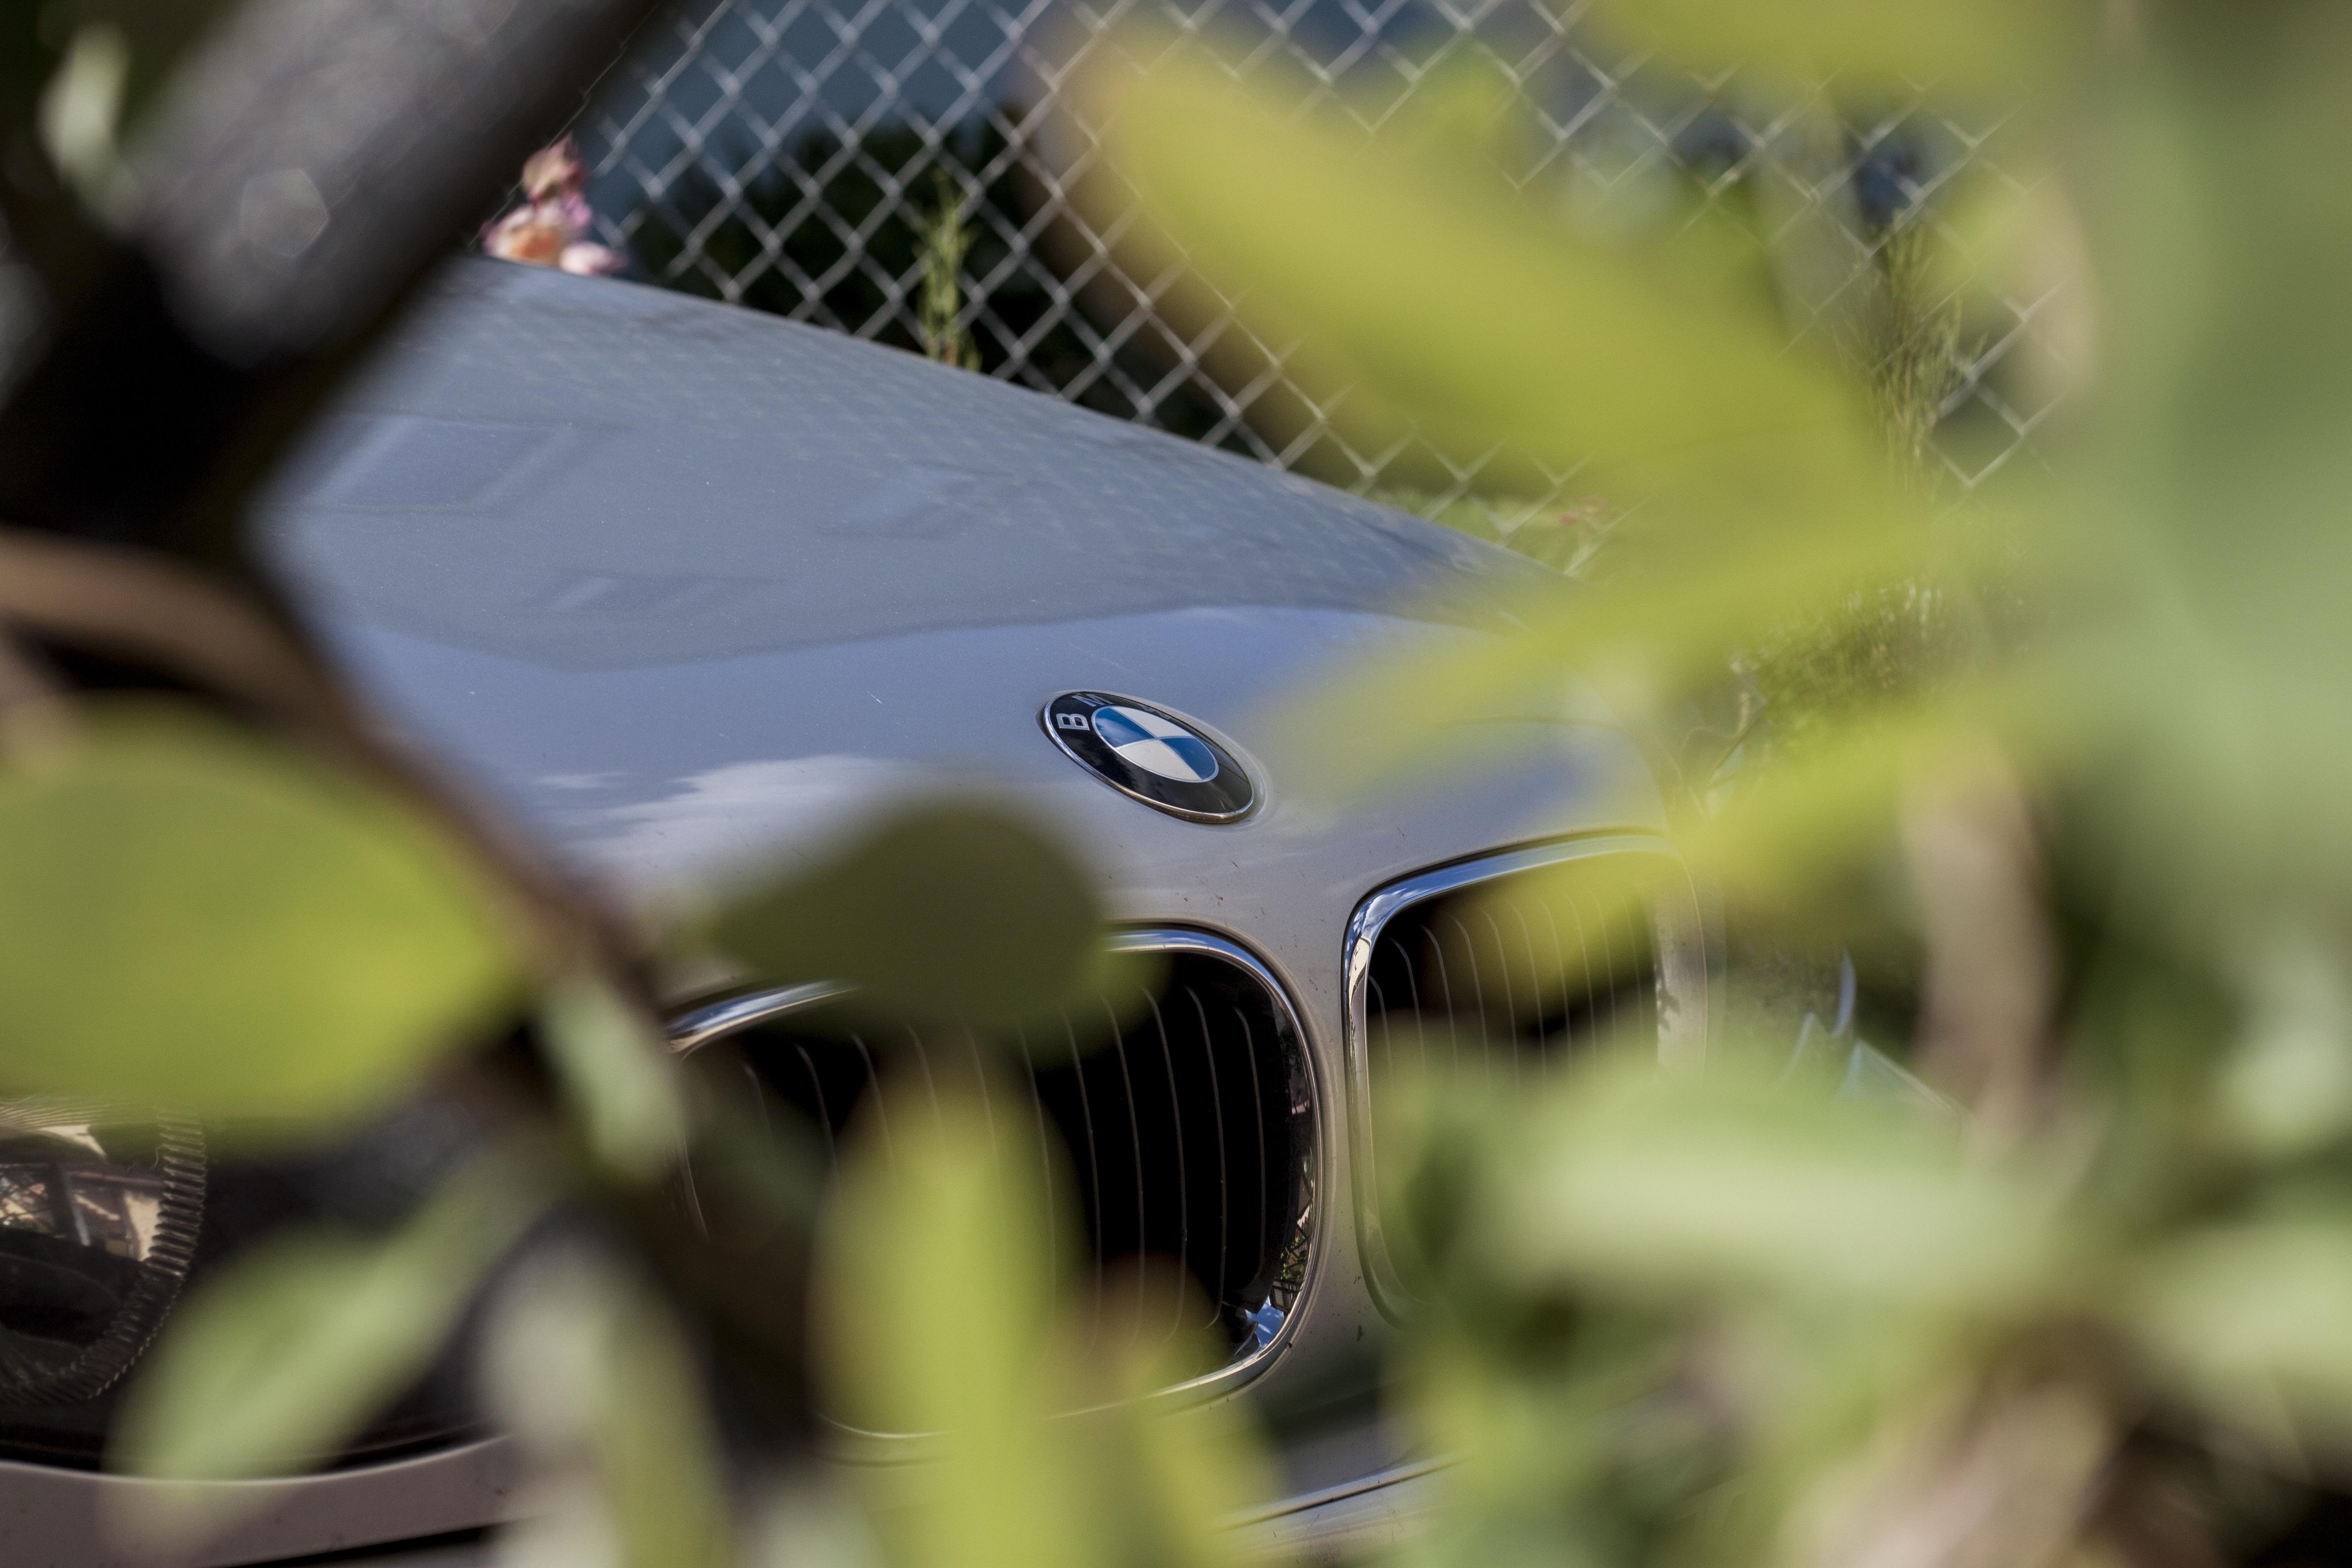 photo up vehicle bmw car green auto images leaf close free logo en mask the macro sunglasses photography